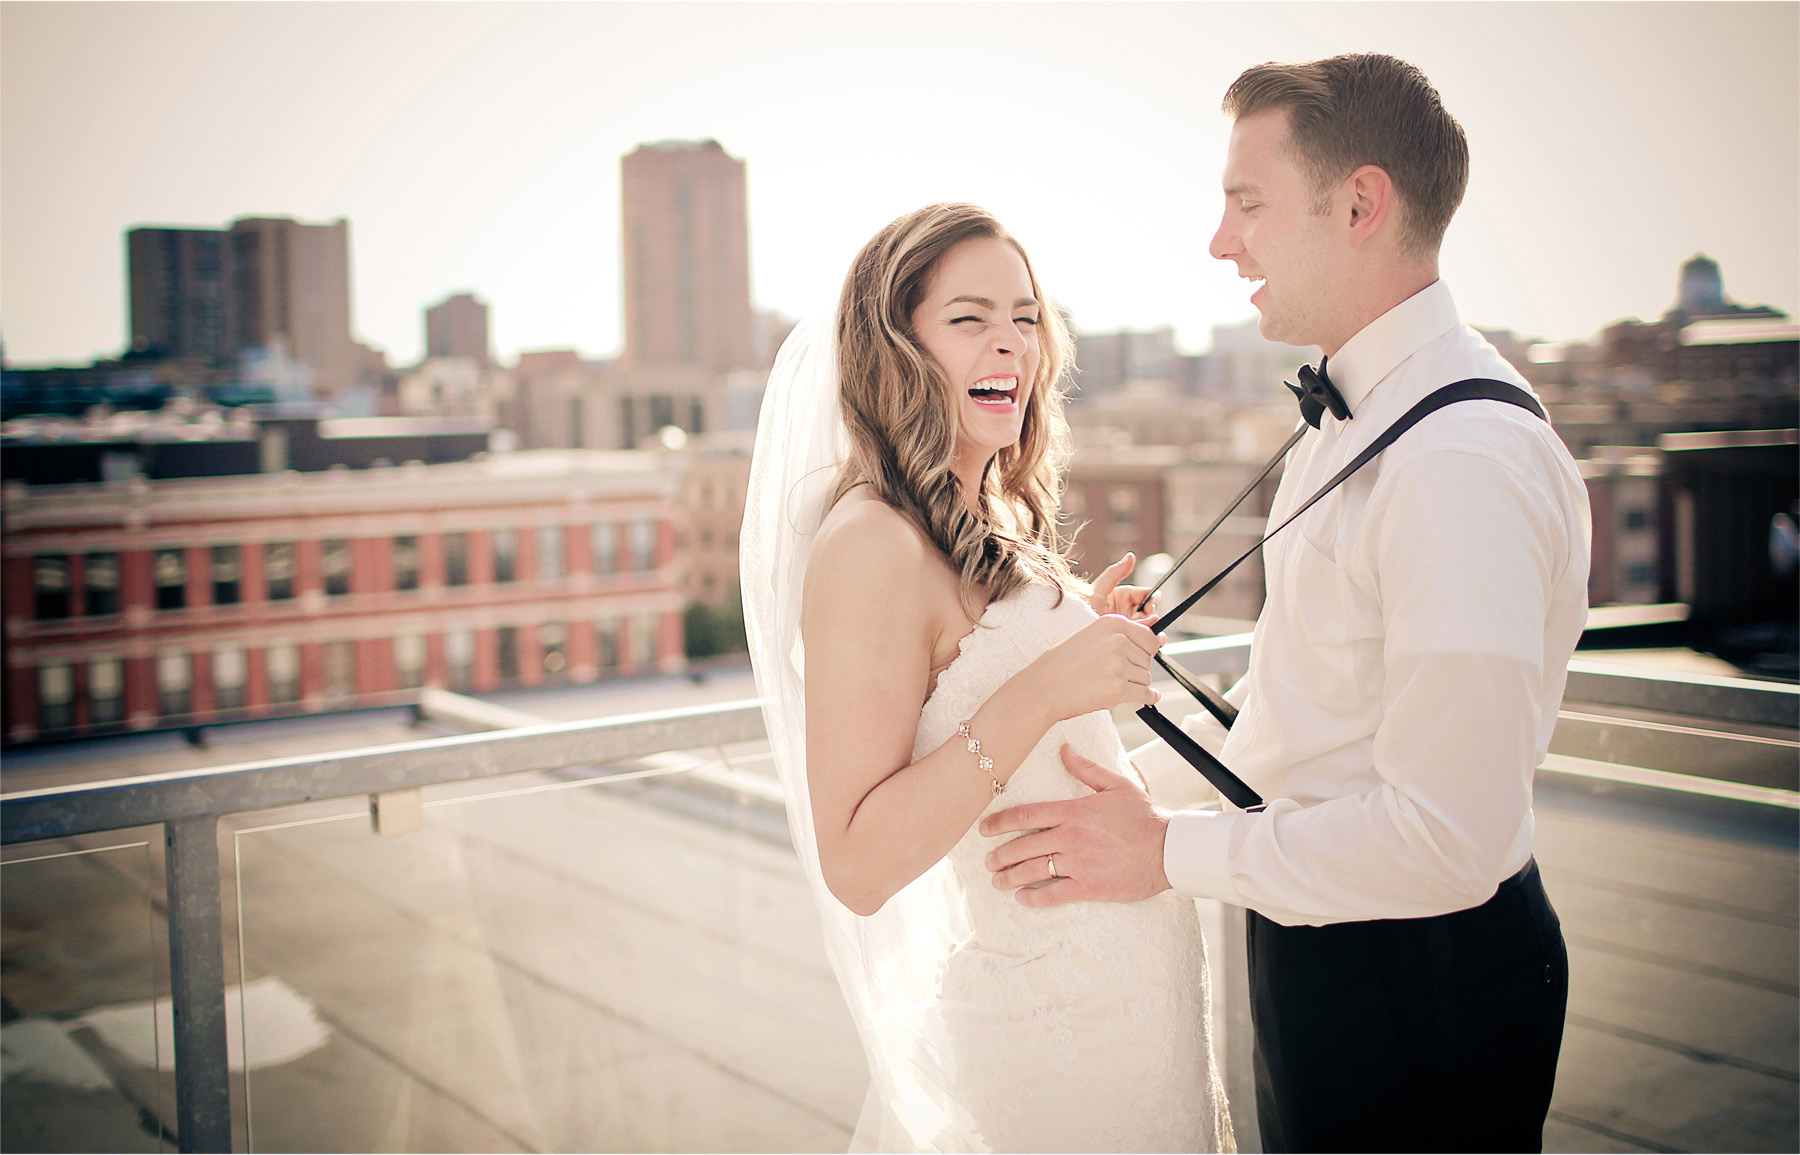 22-Saint-Paul-Minnesota-Wedding-Photographer-by-Andrew-Vick-Photography-Summer-Abulae-Bride-Groom-Suspenders-Bowtie-Vintage-Molly-and-Dan.jpg